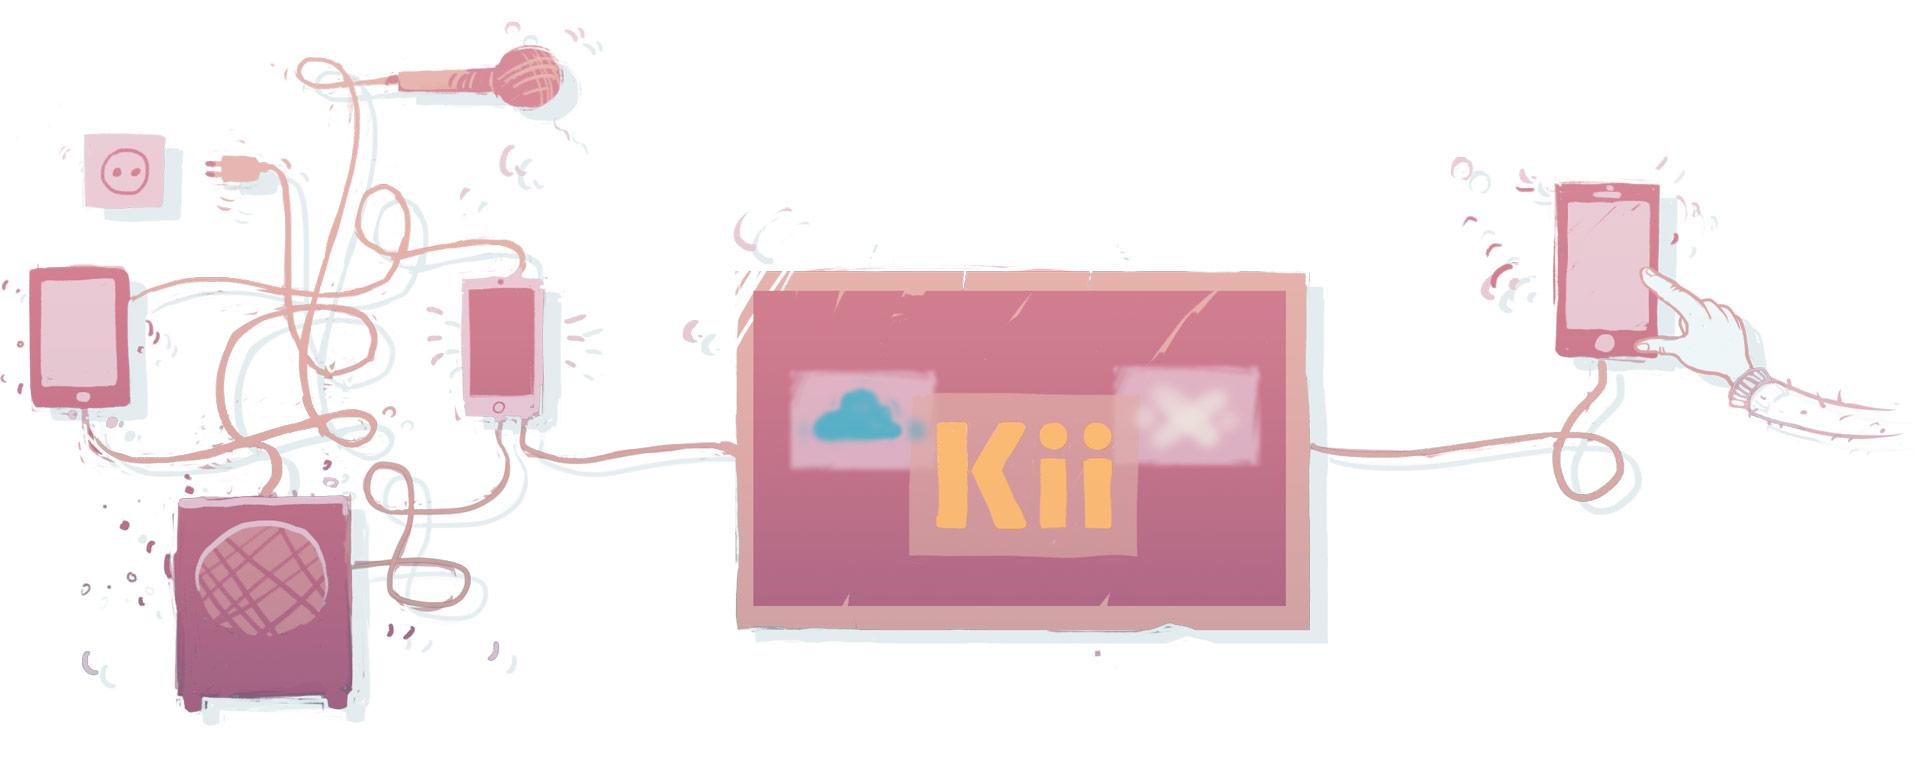 iot-kii-1